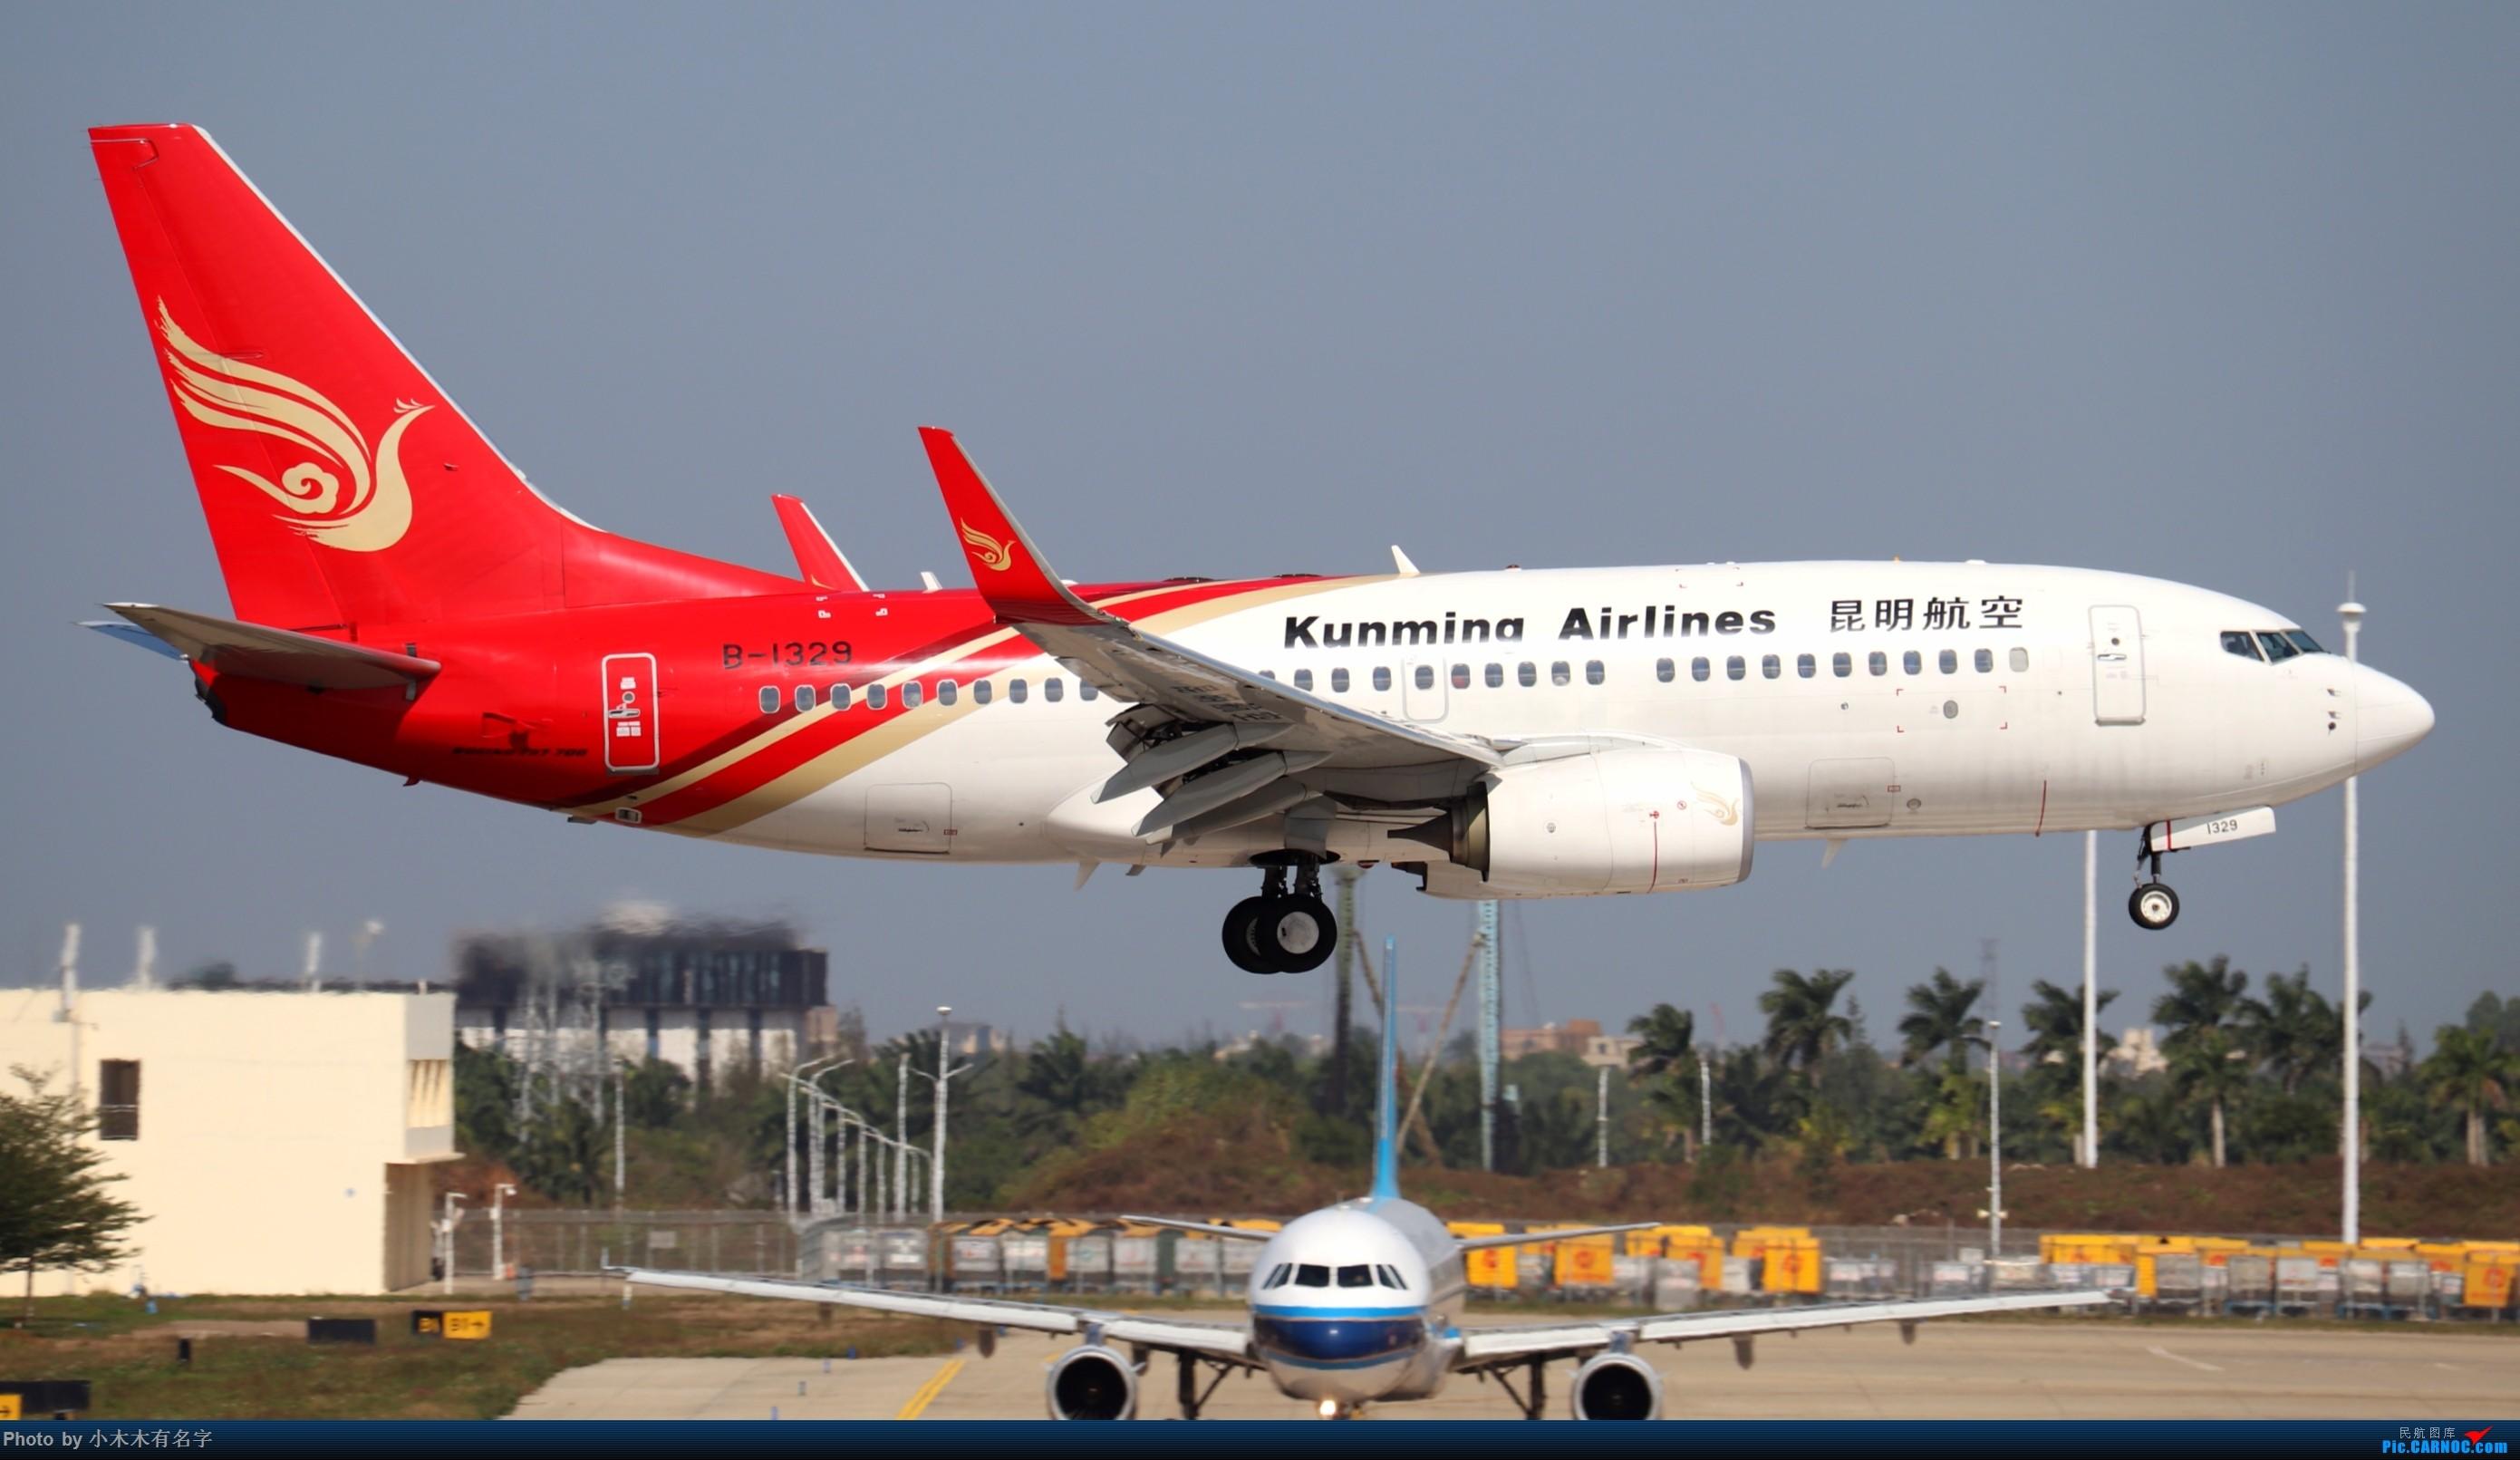 Re:[原创]2019冬天的海口美兰 BOEING 737-700 B-1329 中国海口美兰国际机场